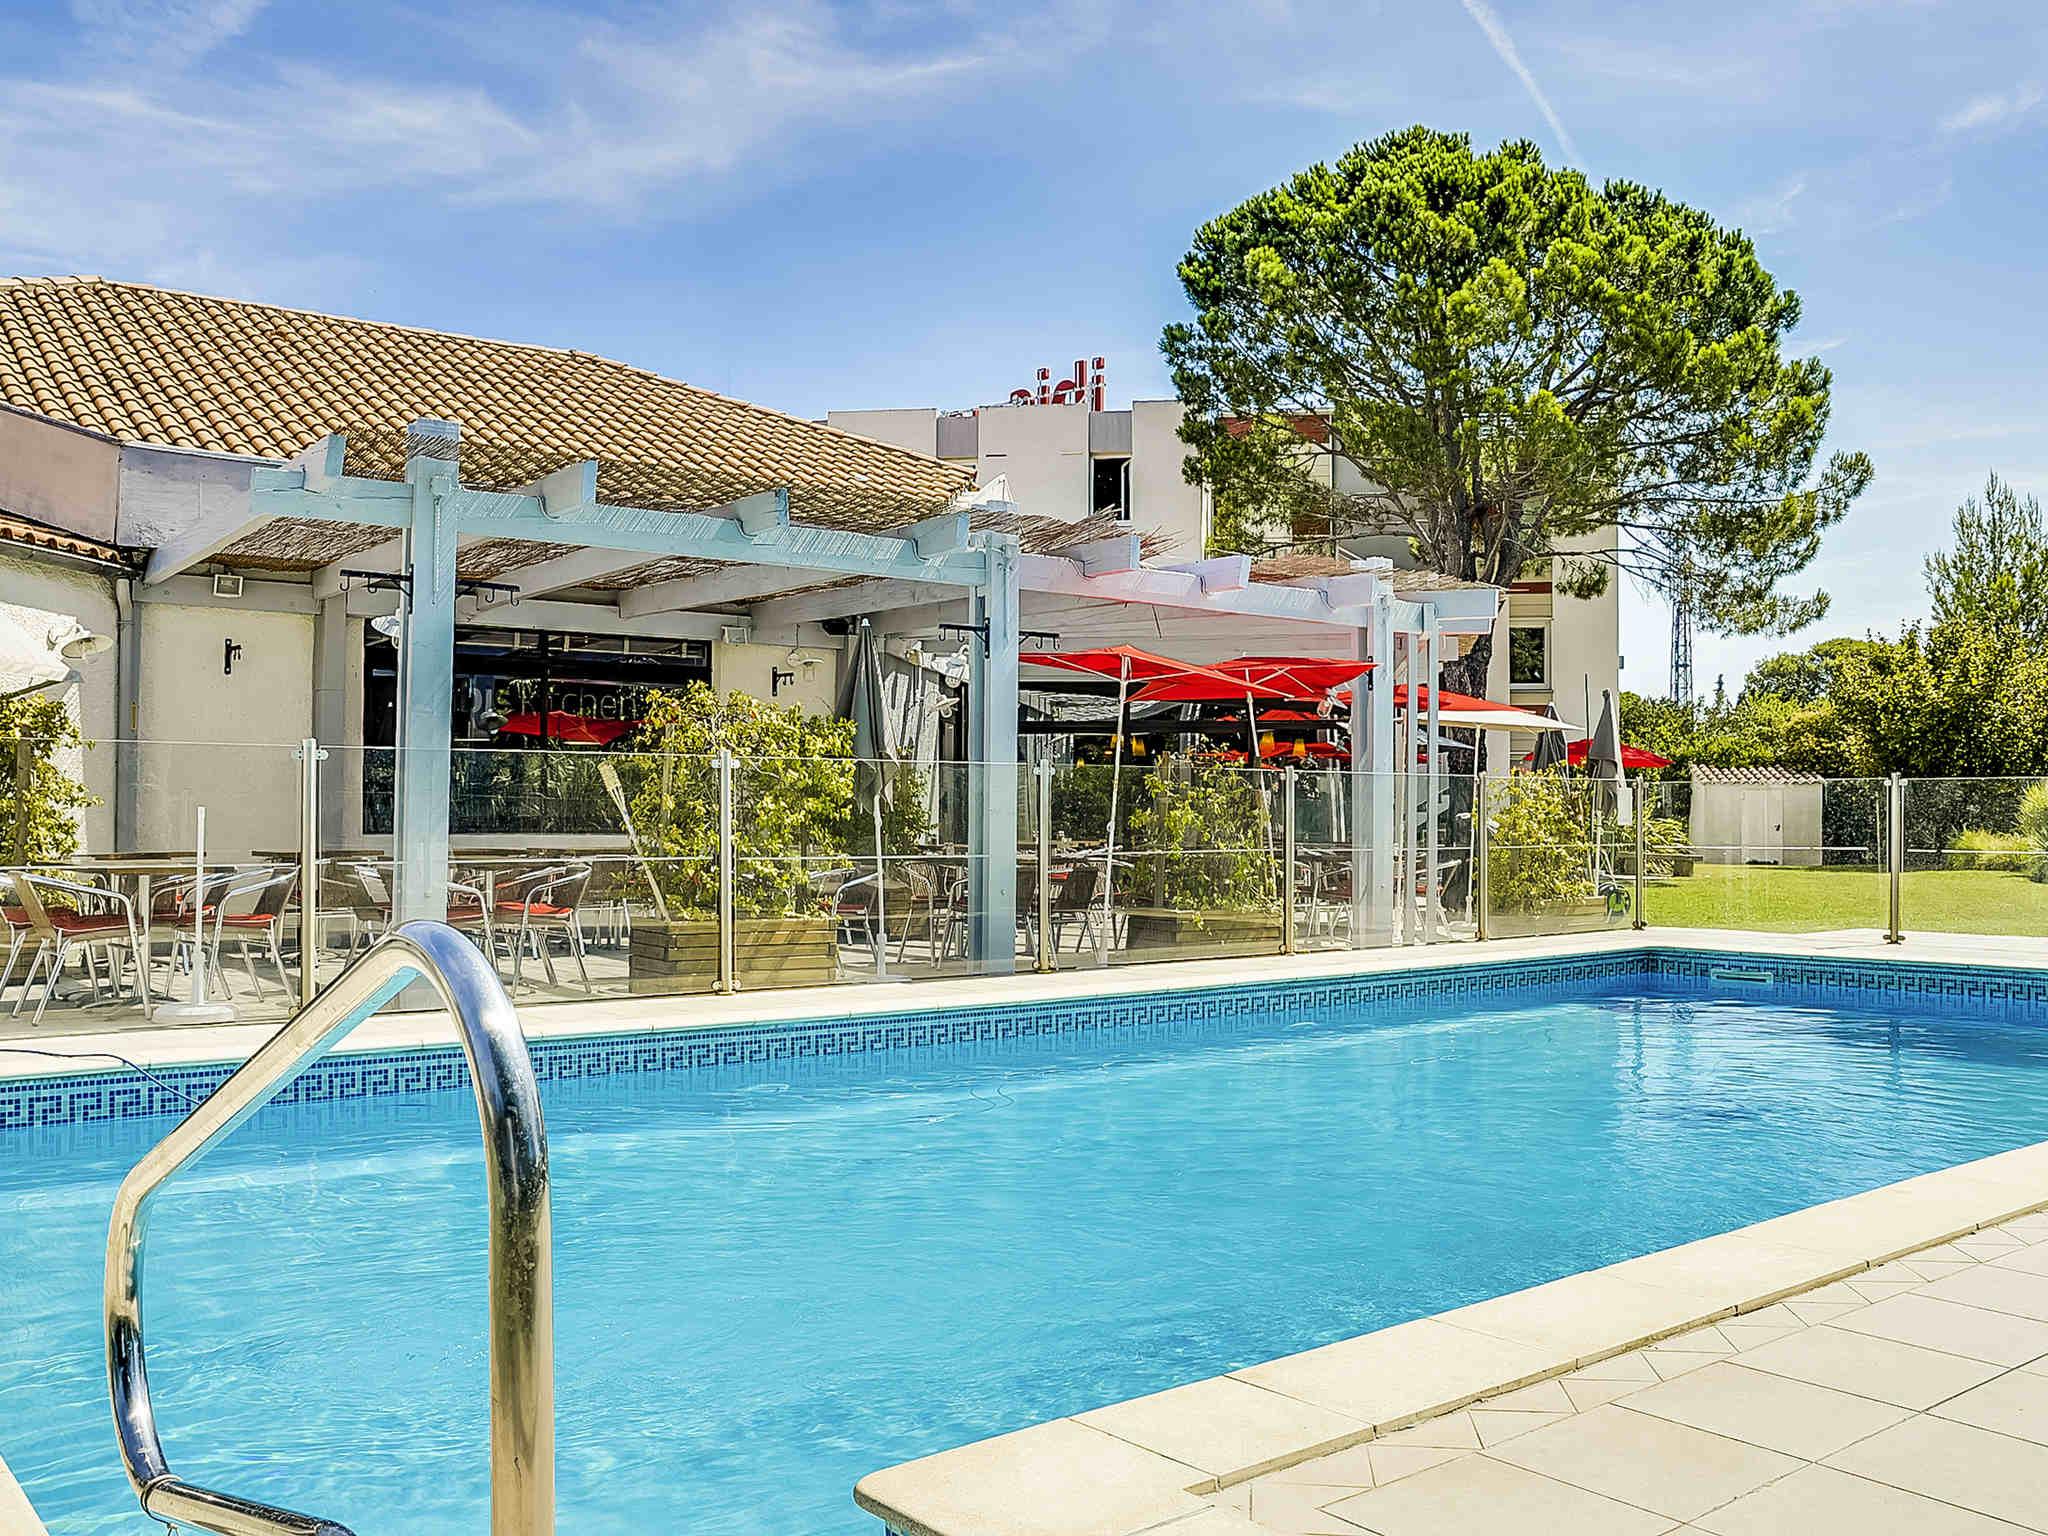 Ibis Hotel Salon De Provence